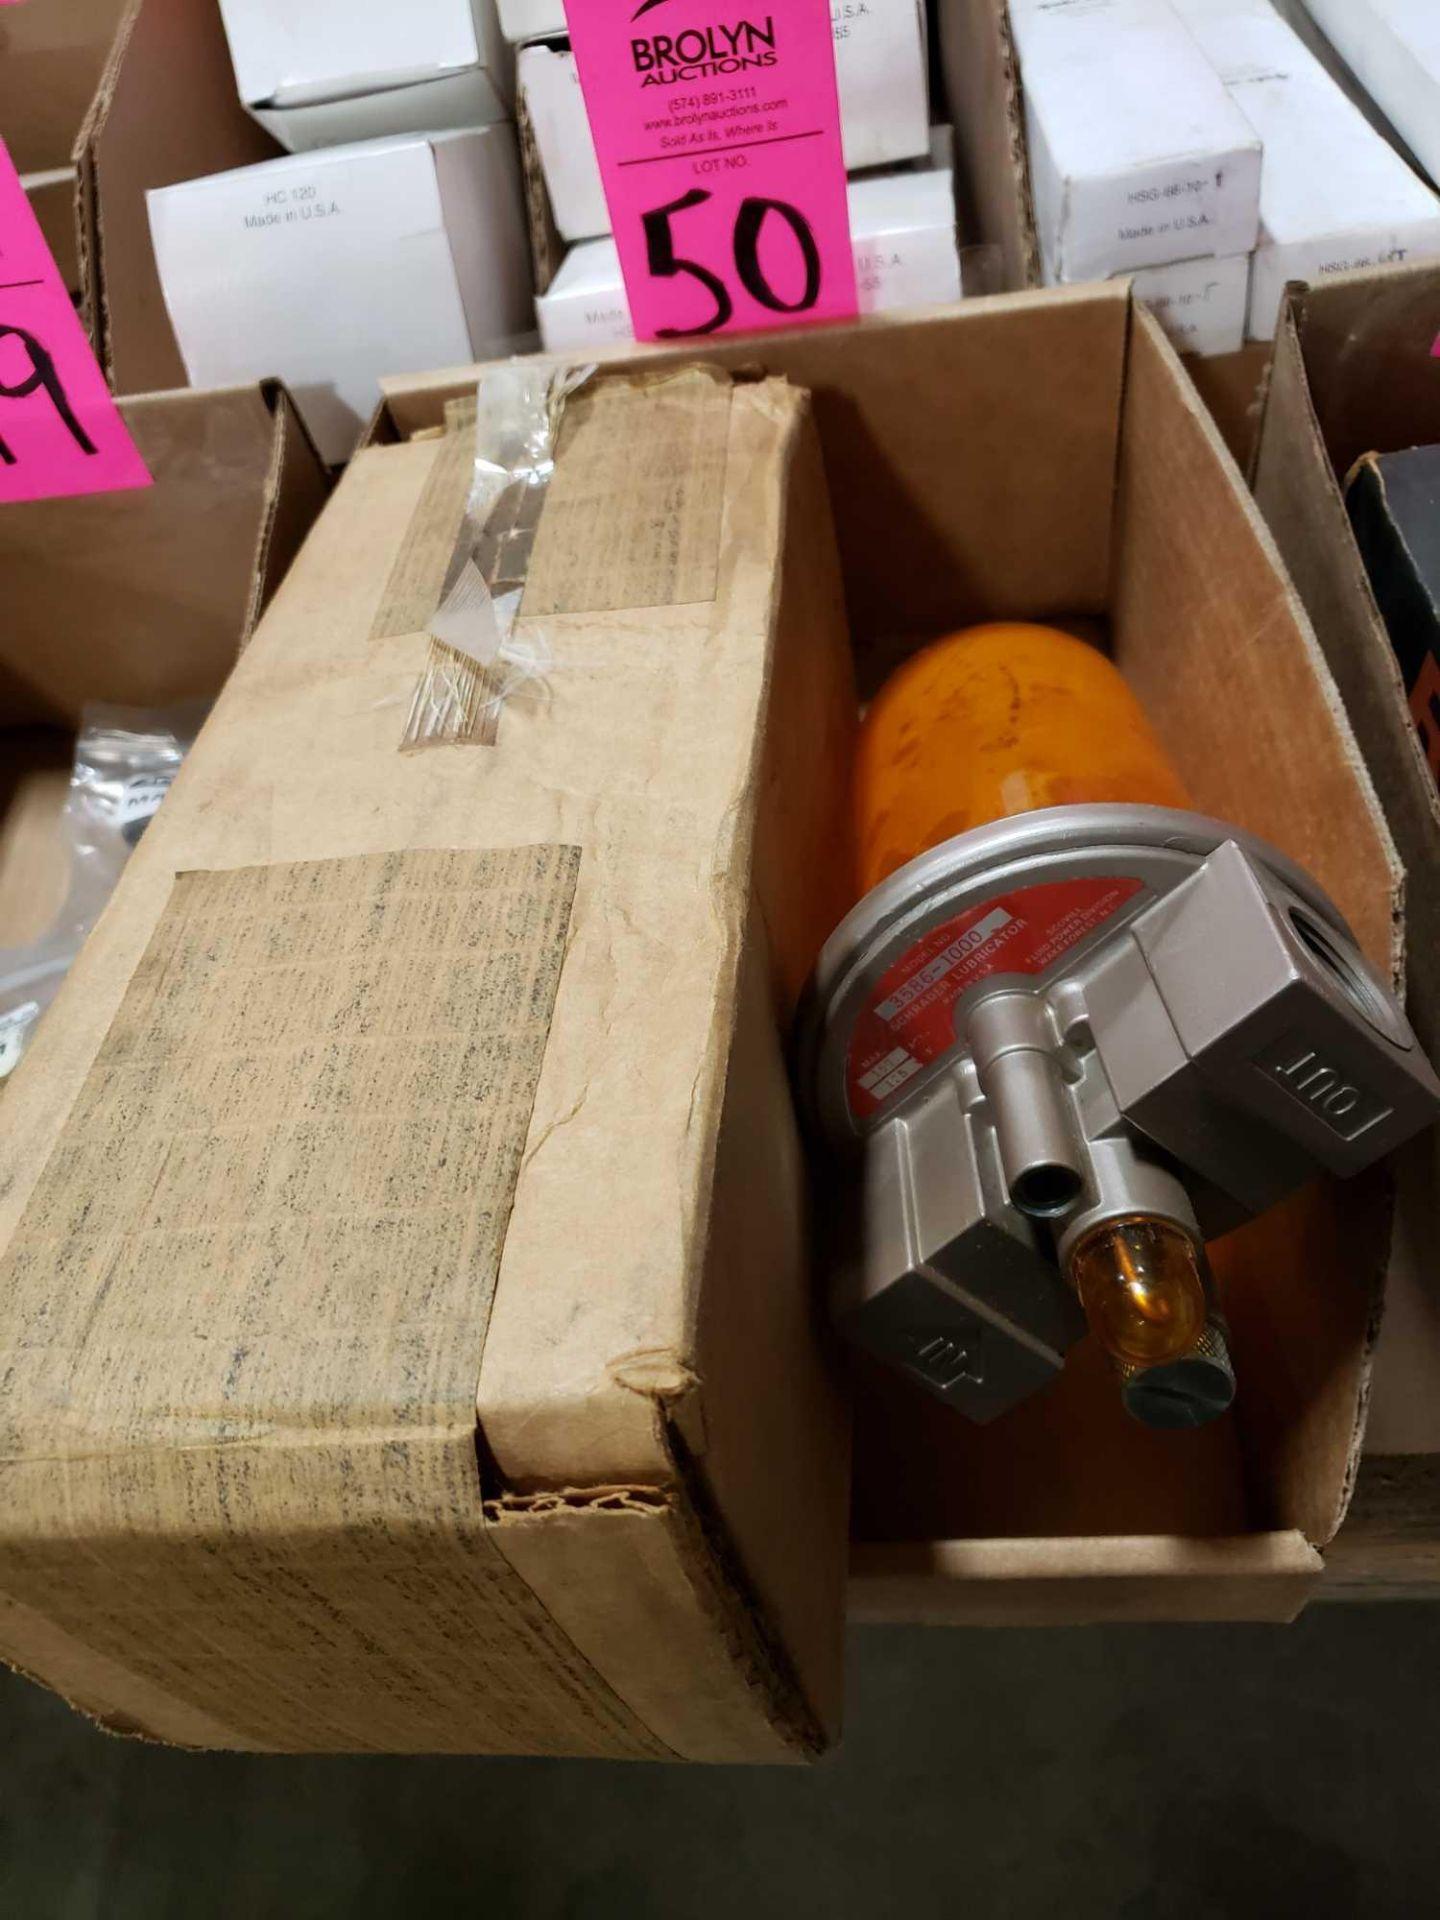 Lot 50 - Schrader lubricator model 3586-1000. New in box.